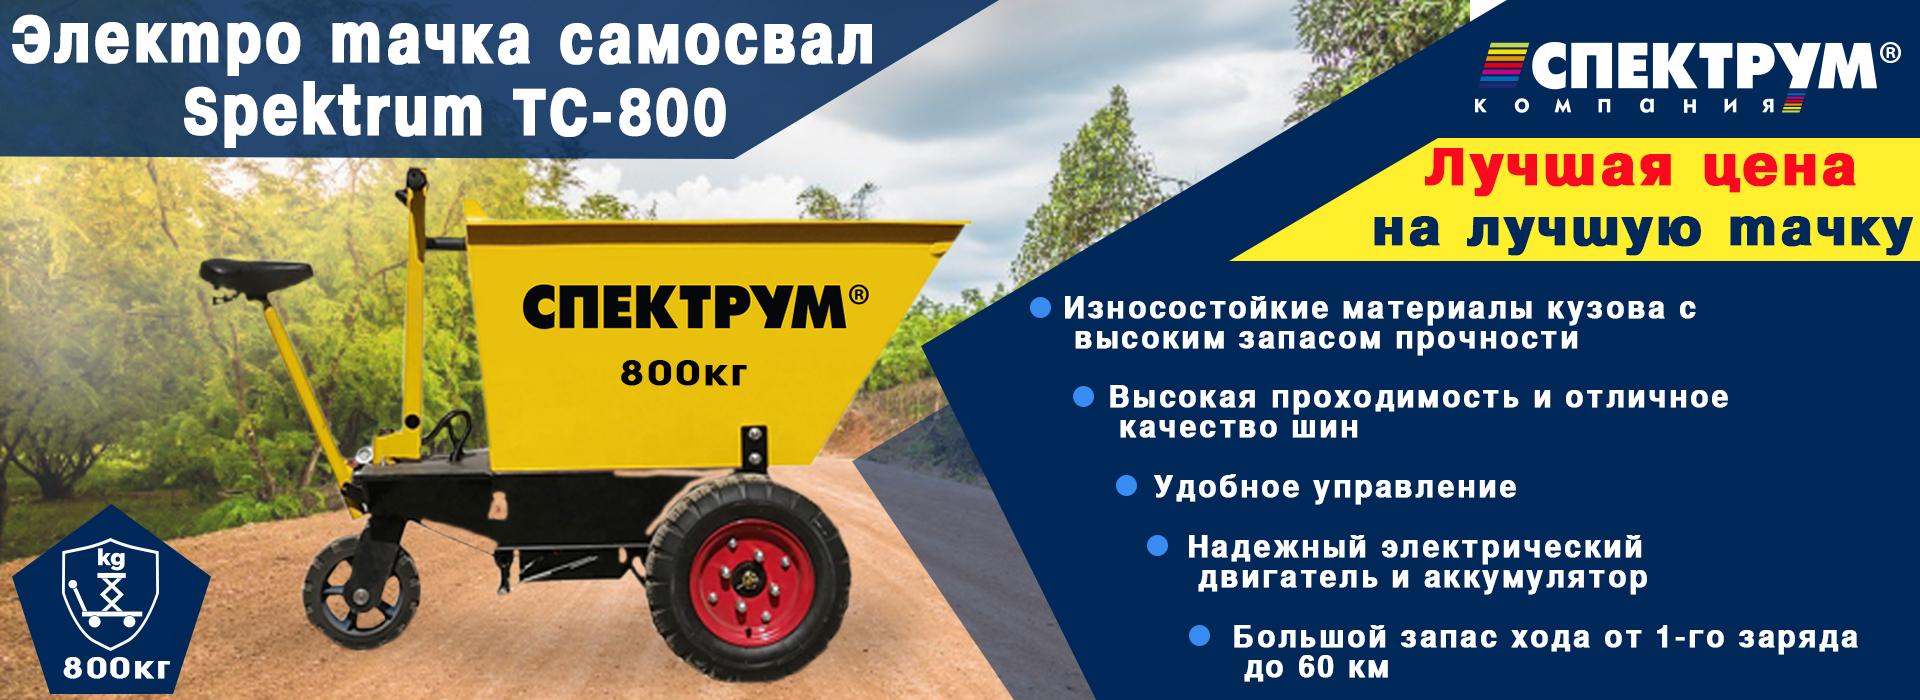 banner-ts-800